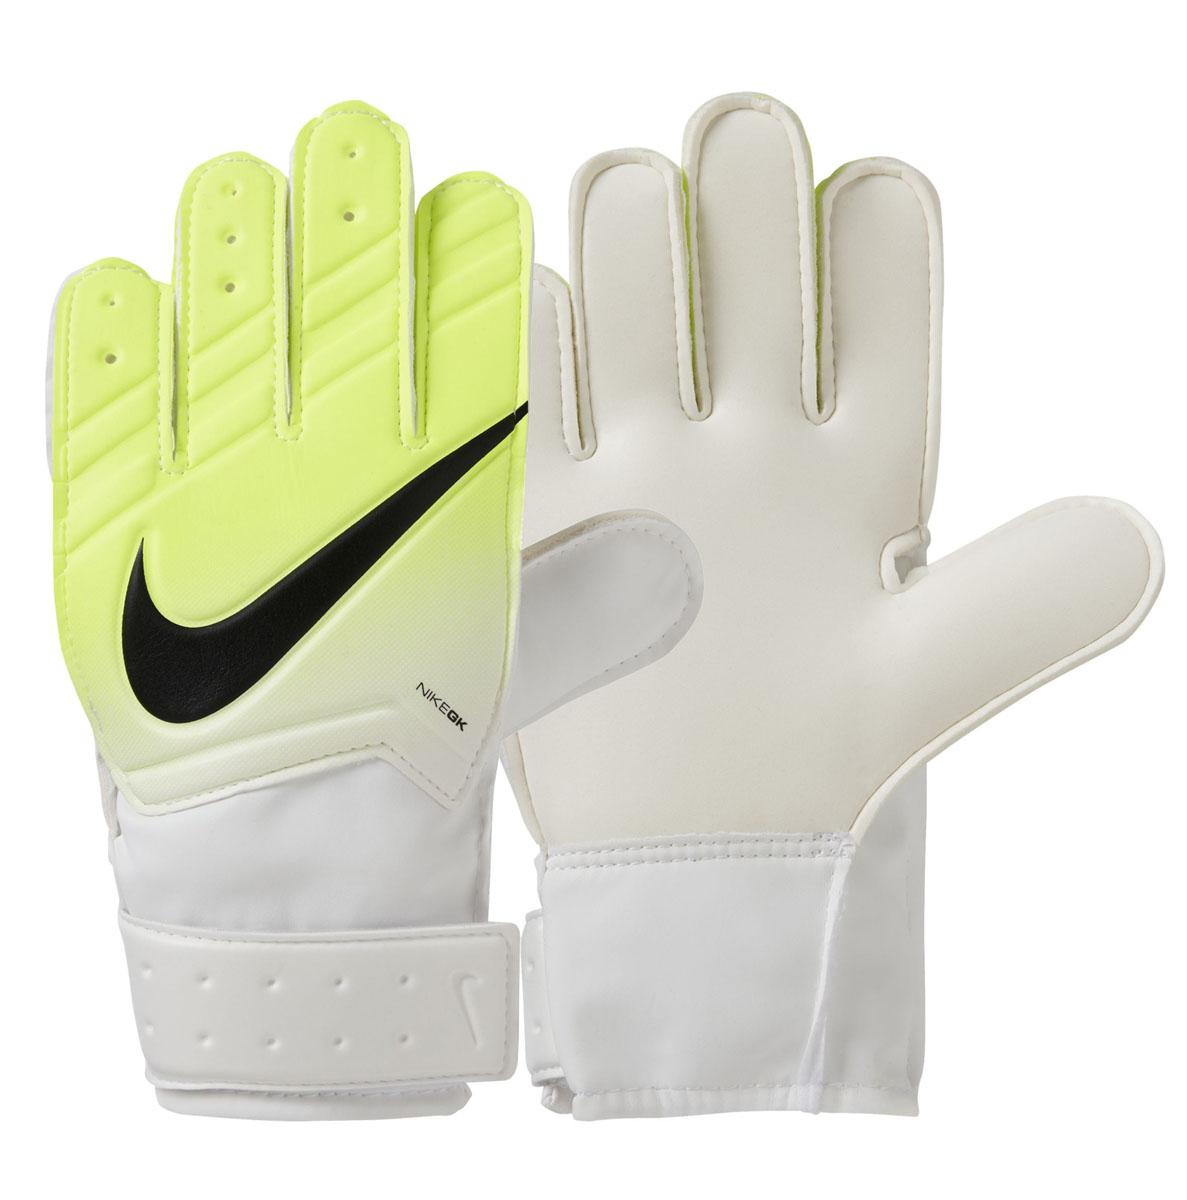 Перчатки вратарские Nike  Gk Jr Match Fa16 , цвет: желтый, белый, черный. Размер 5 - Футбол